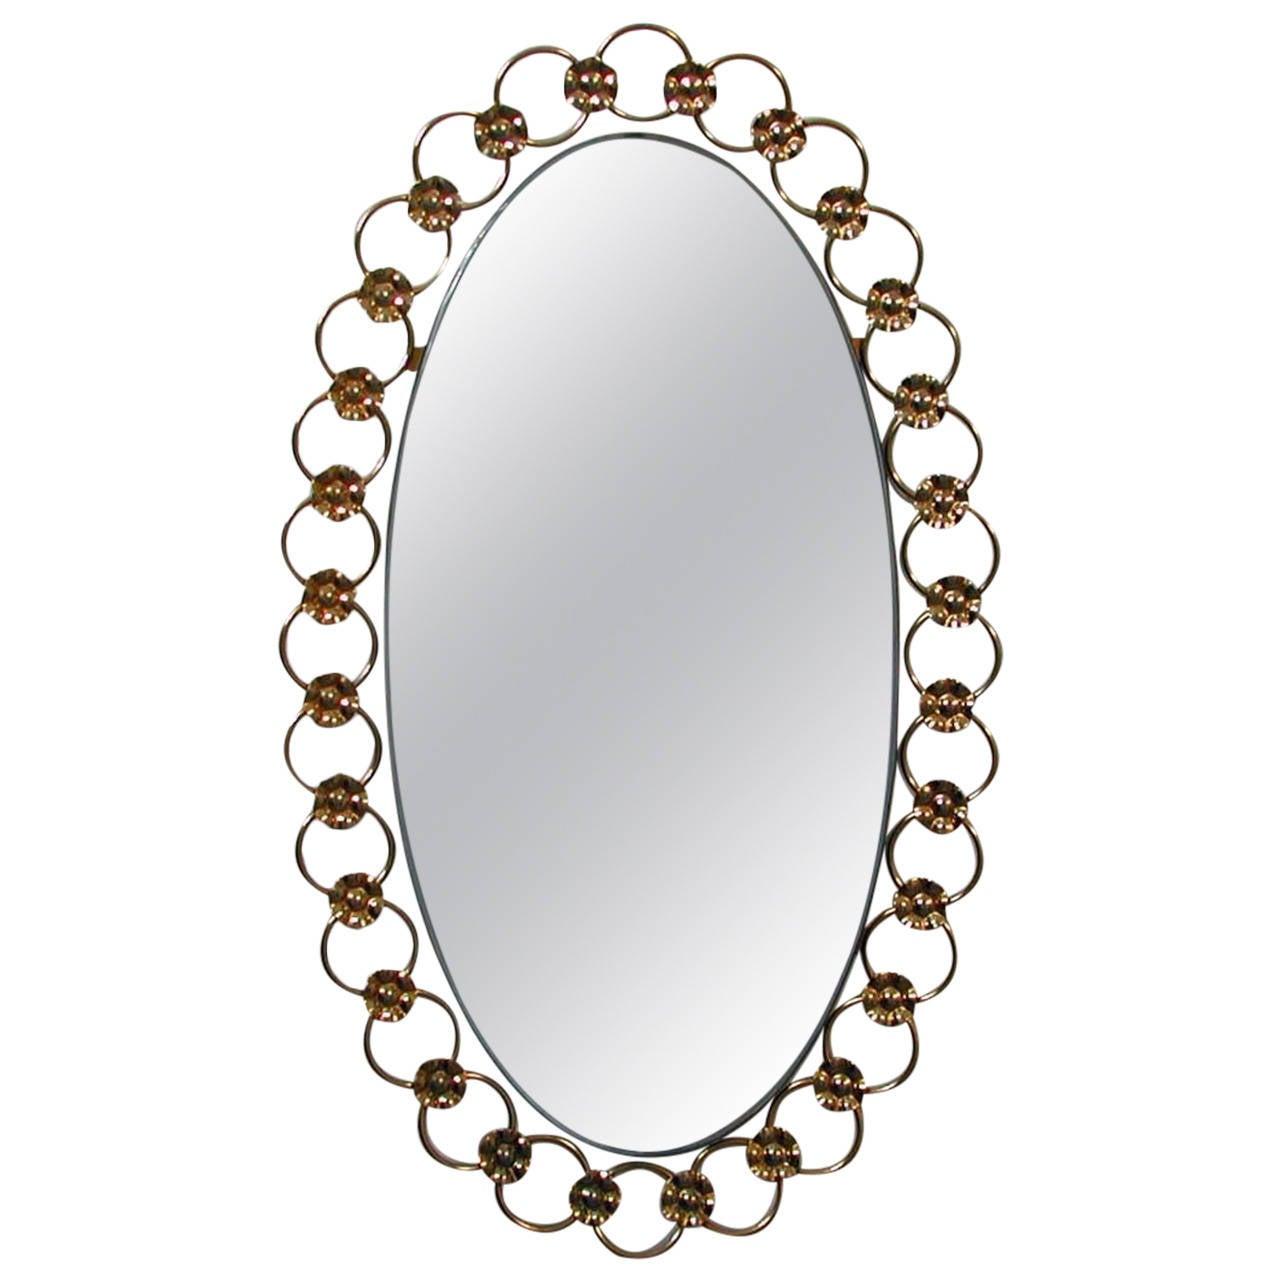 Midcentury Italian Floral Brass Wall Mirror, 1950s